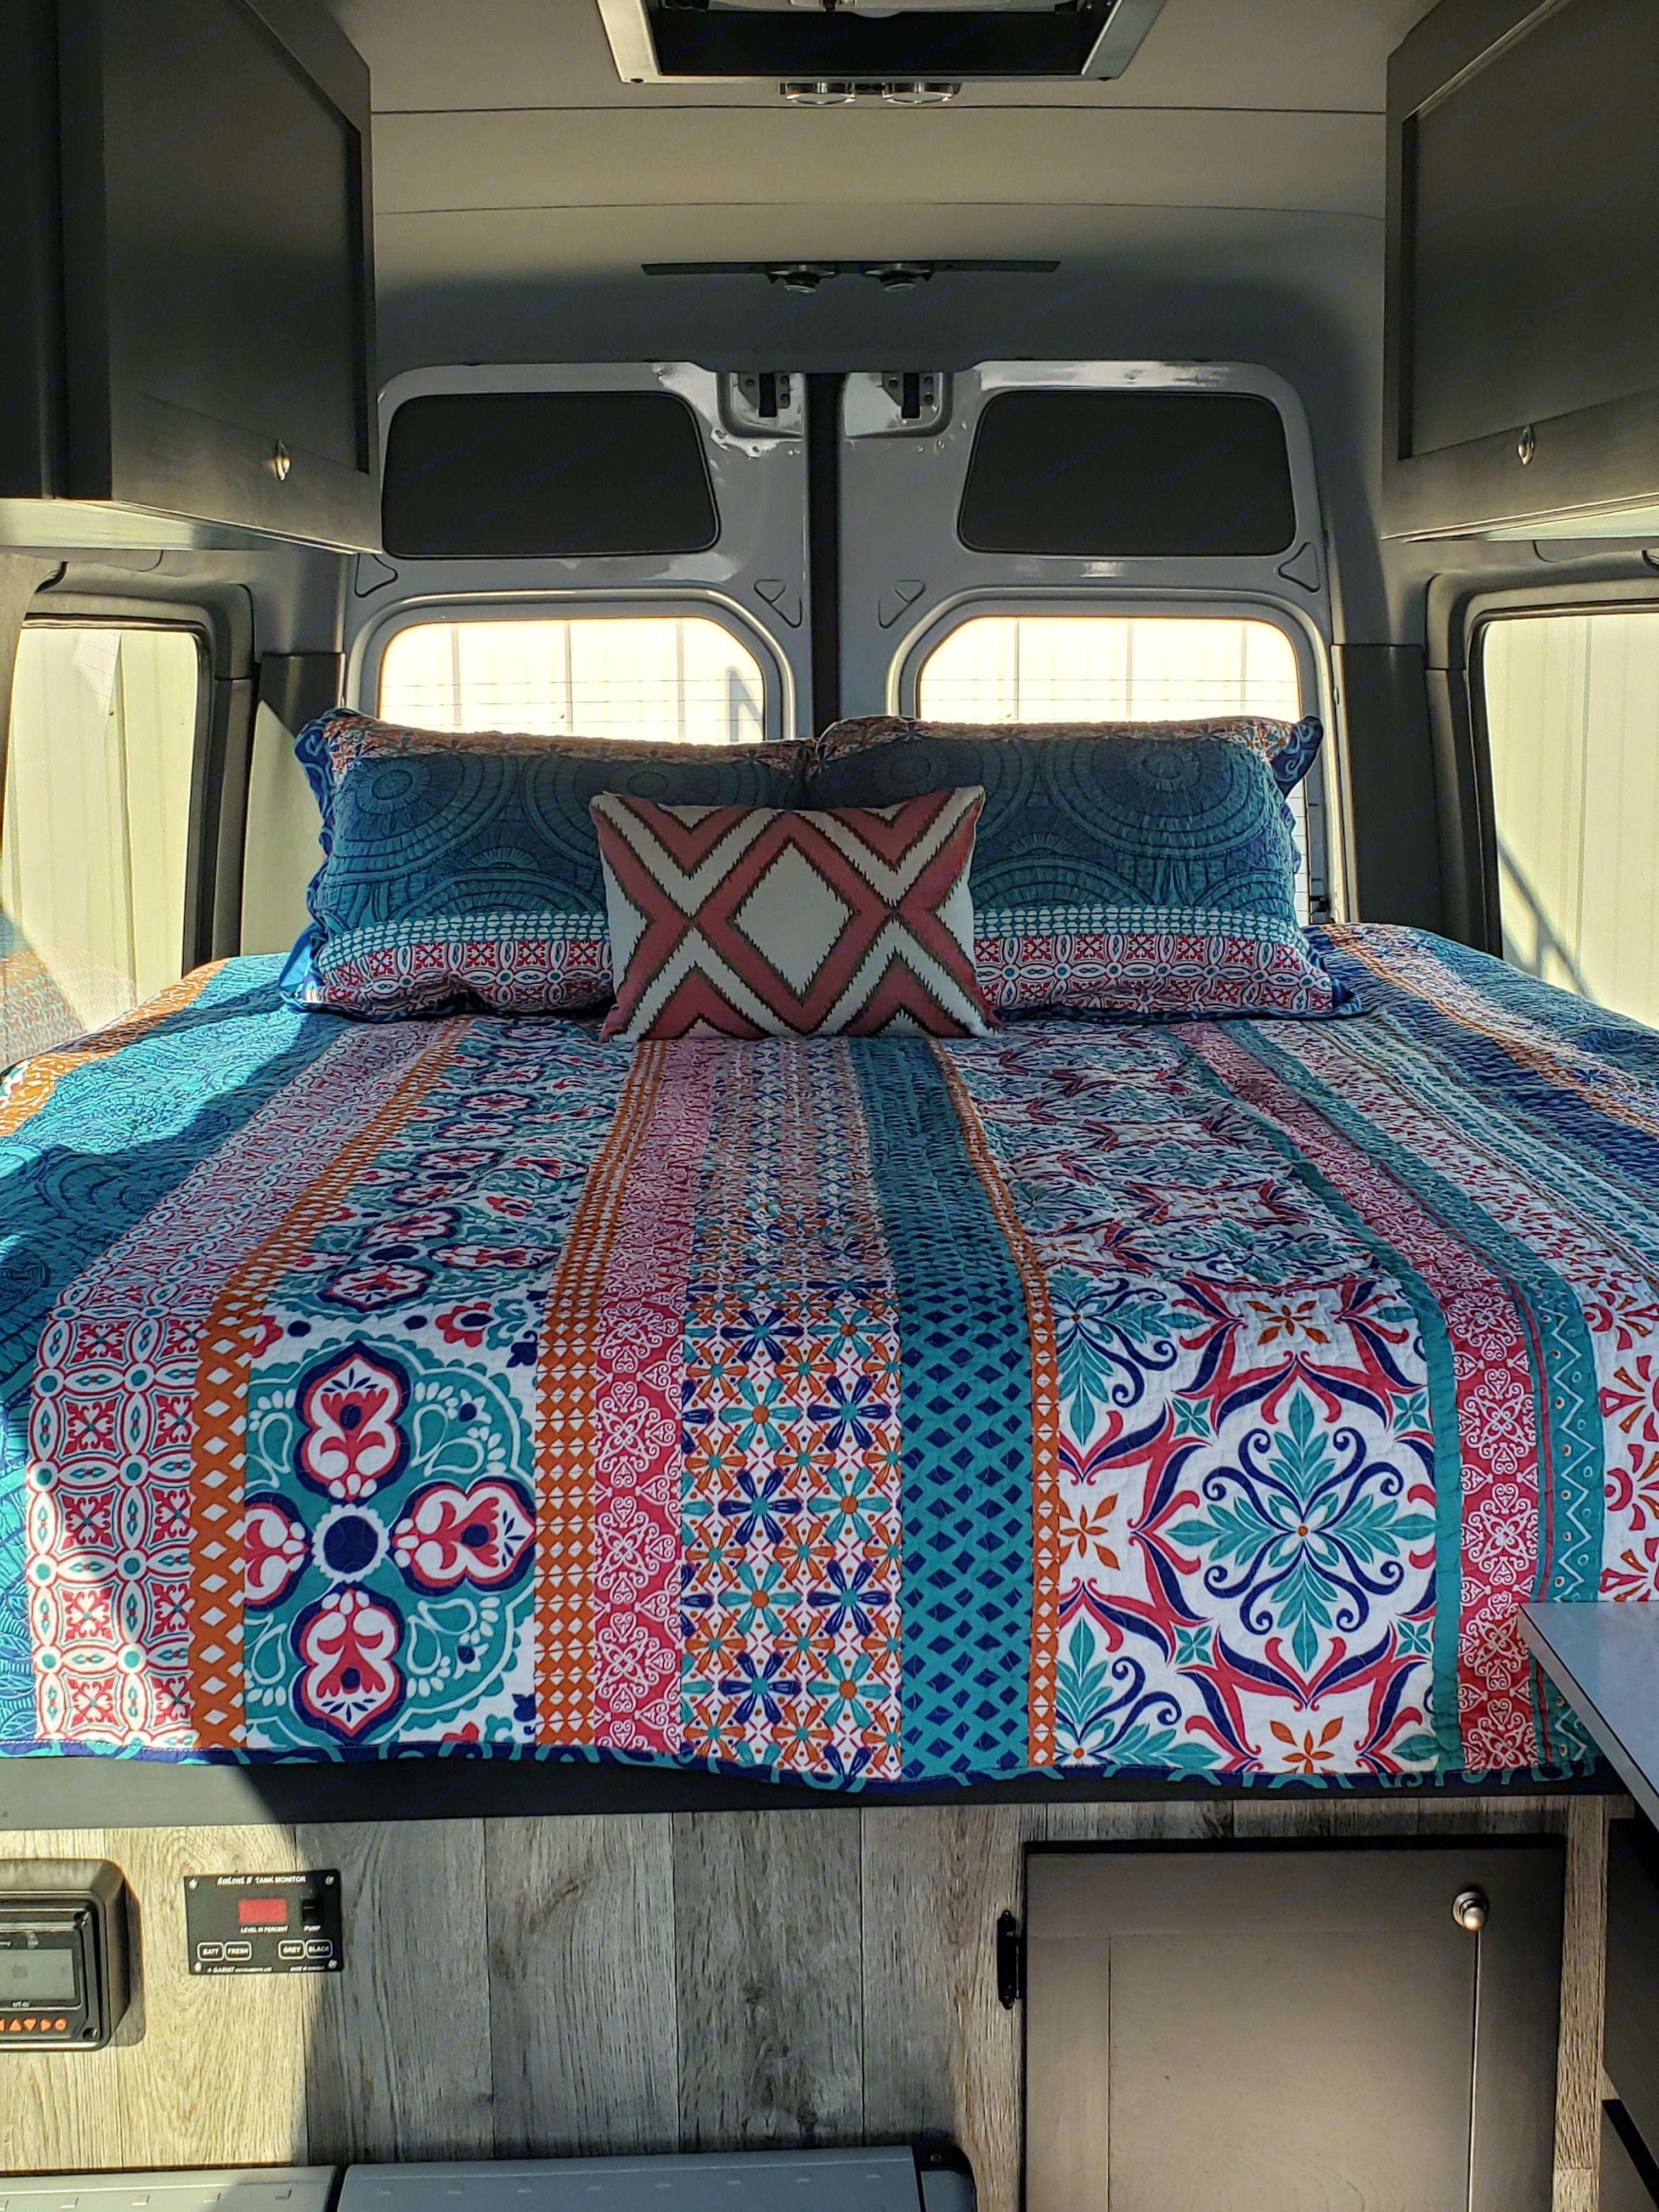 King size bed. Mercedes-Benz Sprinter 2013